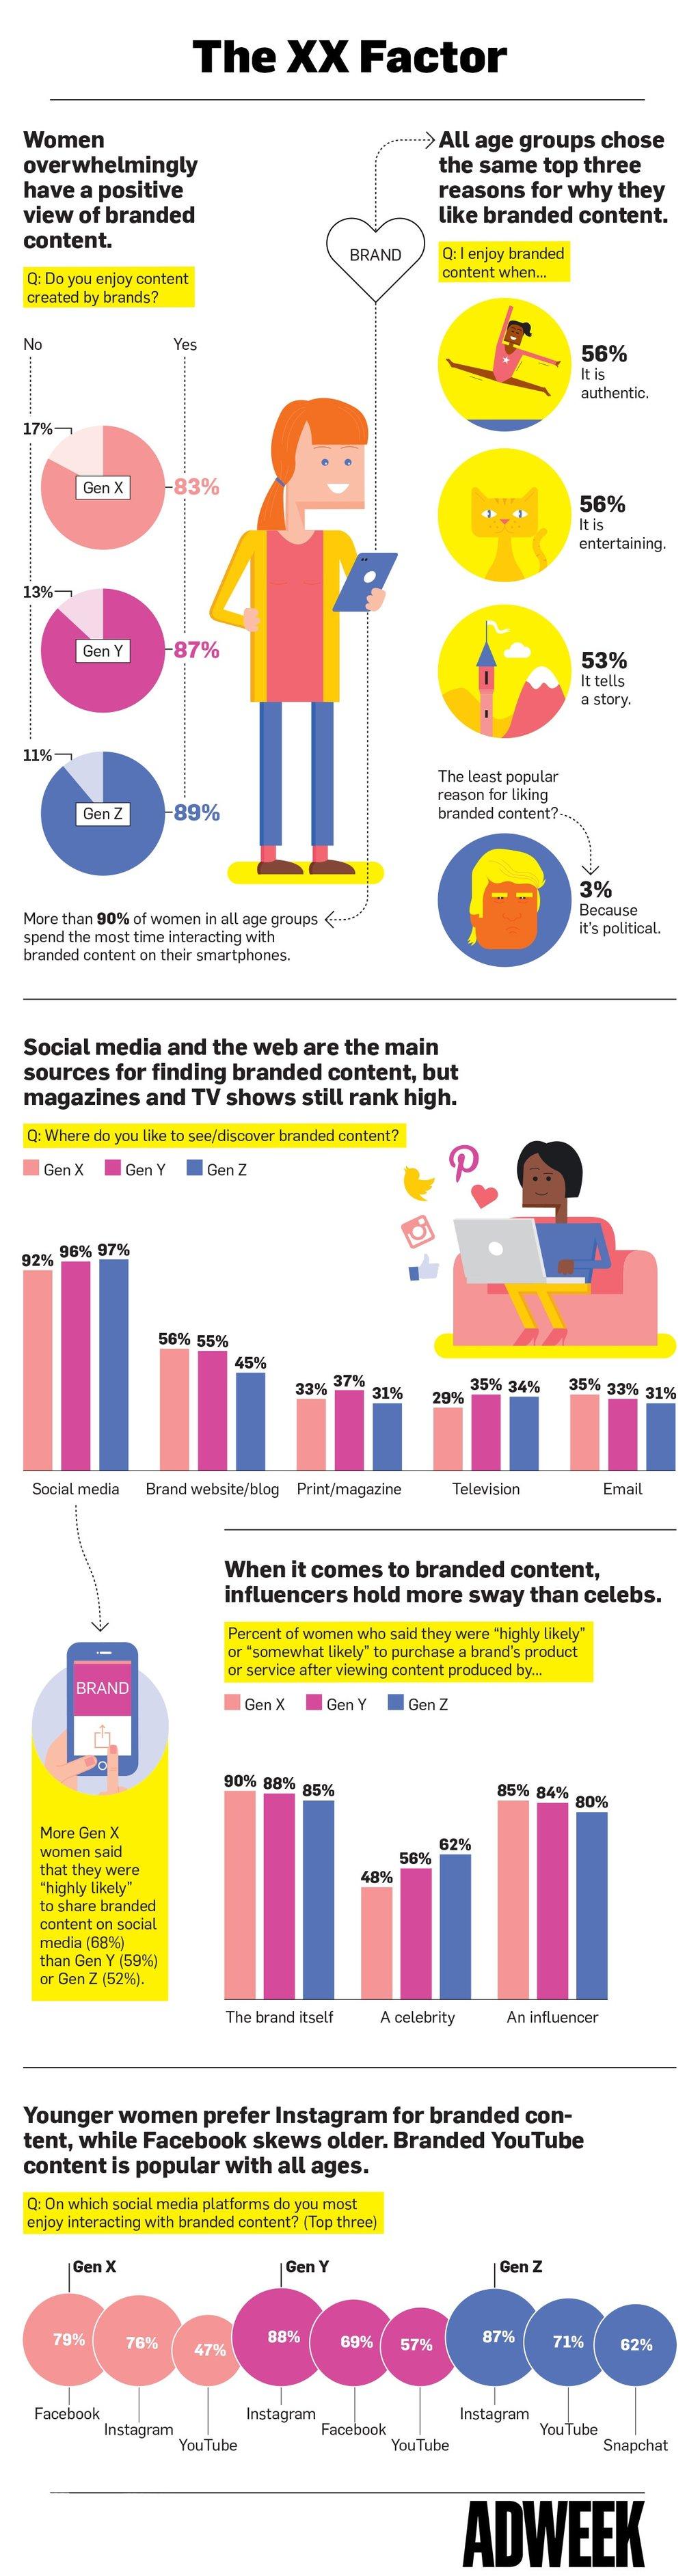 adweek-infographic-influenster-survey.jpg